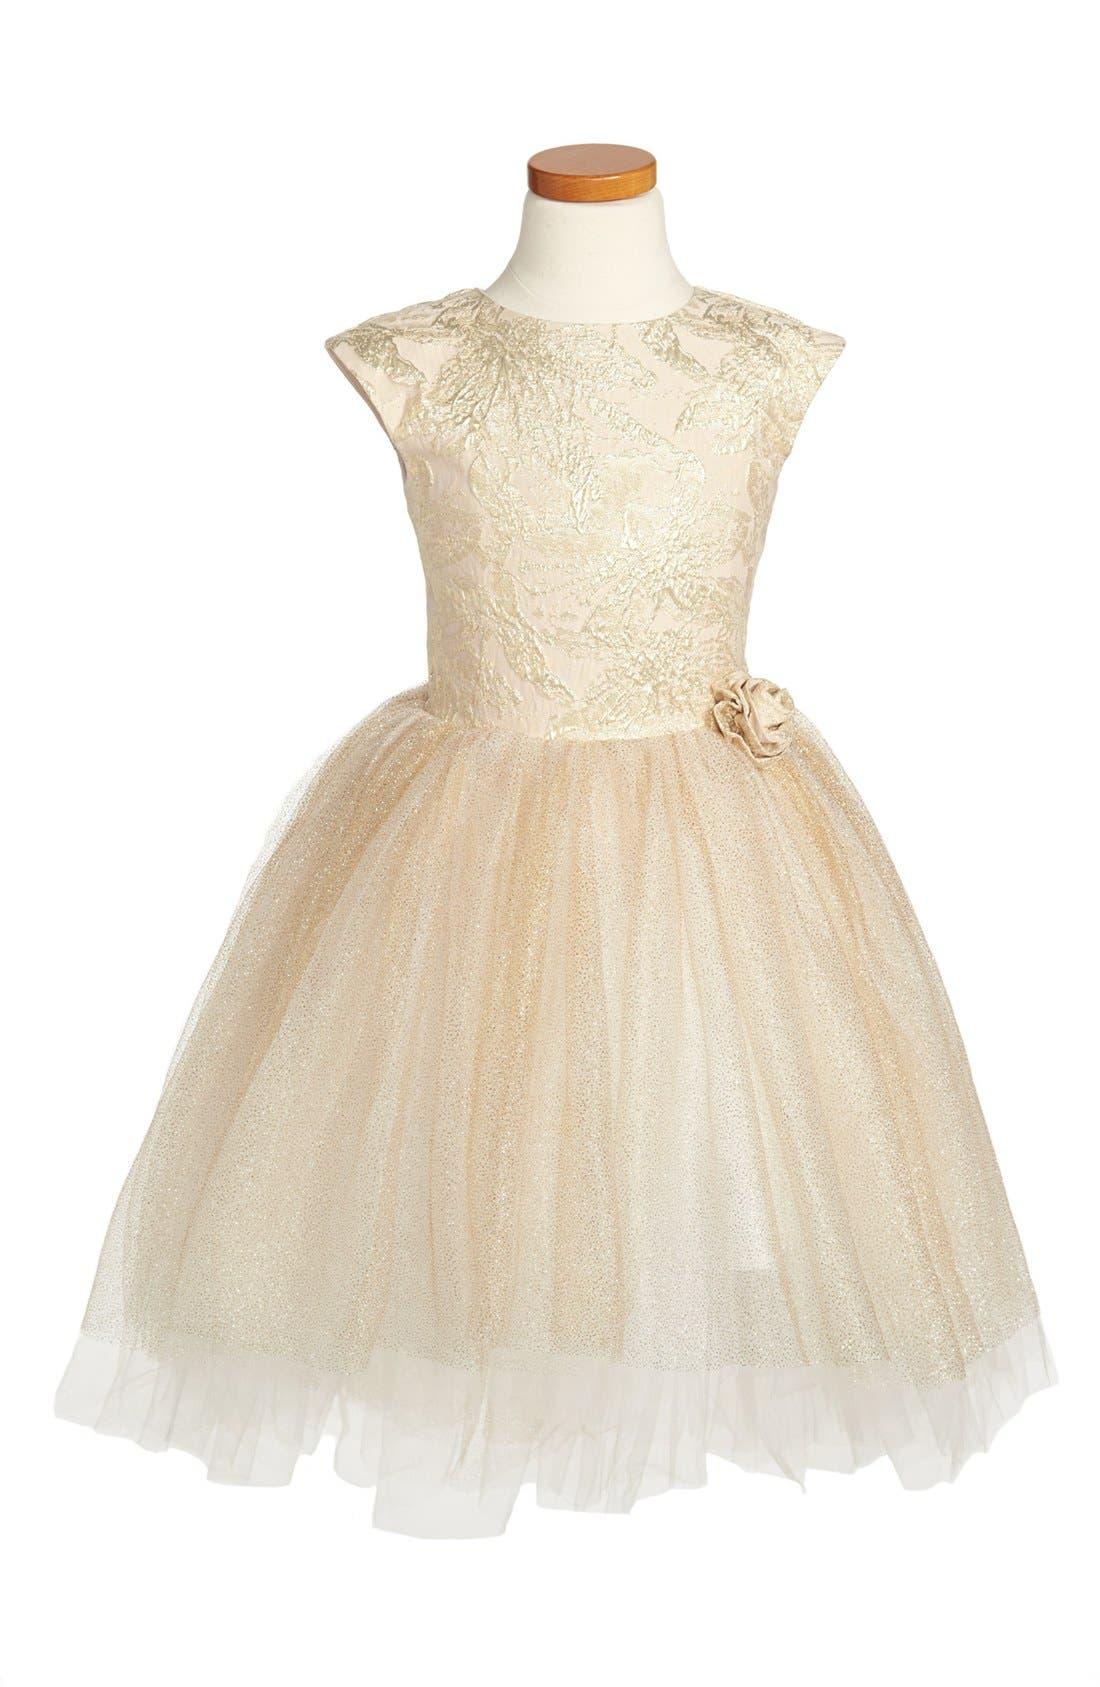 Main Image - Halabaloo 'Princess' Dress (Little Girls & Big Girls)